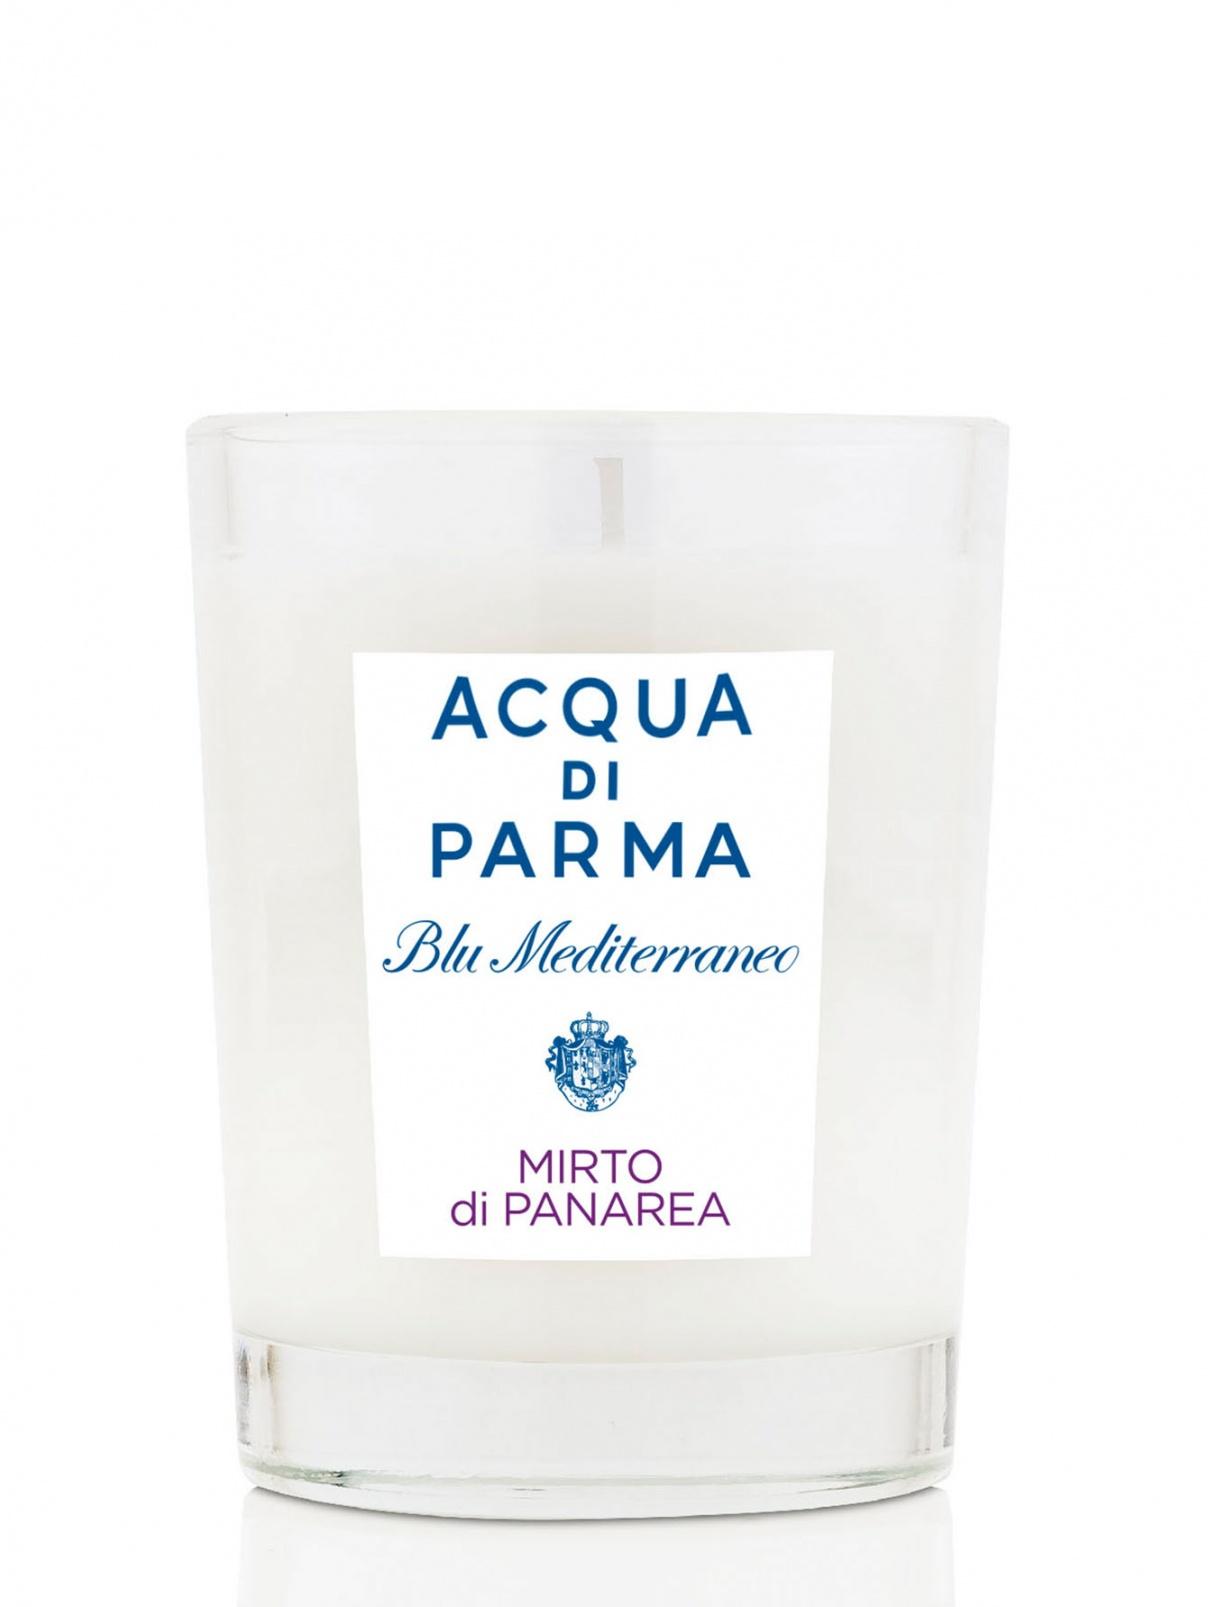 Свеча 200 г MIRTO DI PANAREA Blu Mediterraneo Acqua di Parma  –  Общий вид